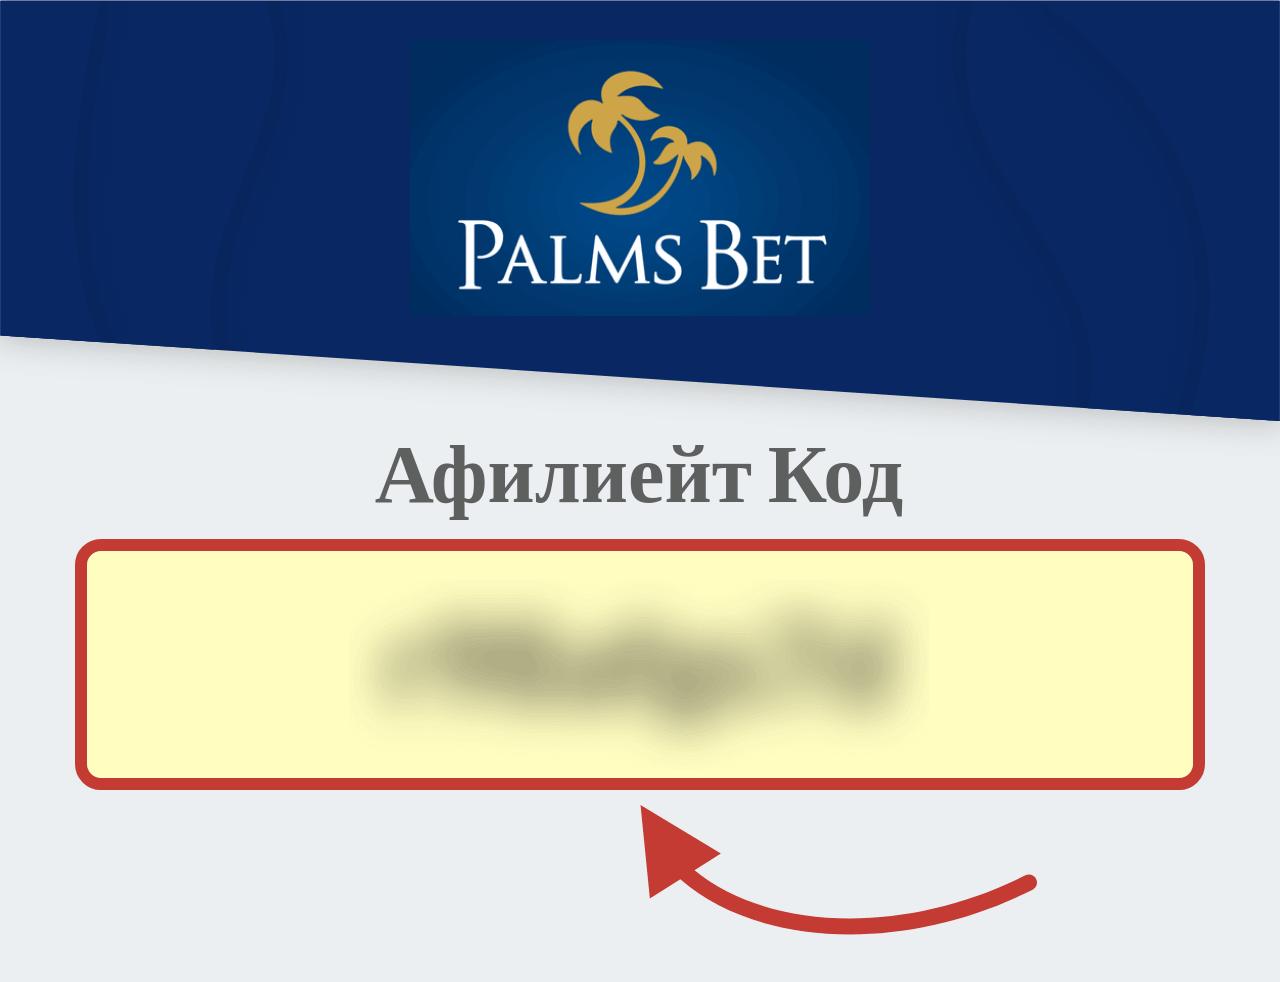 Palms Bet Афилиейт код